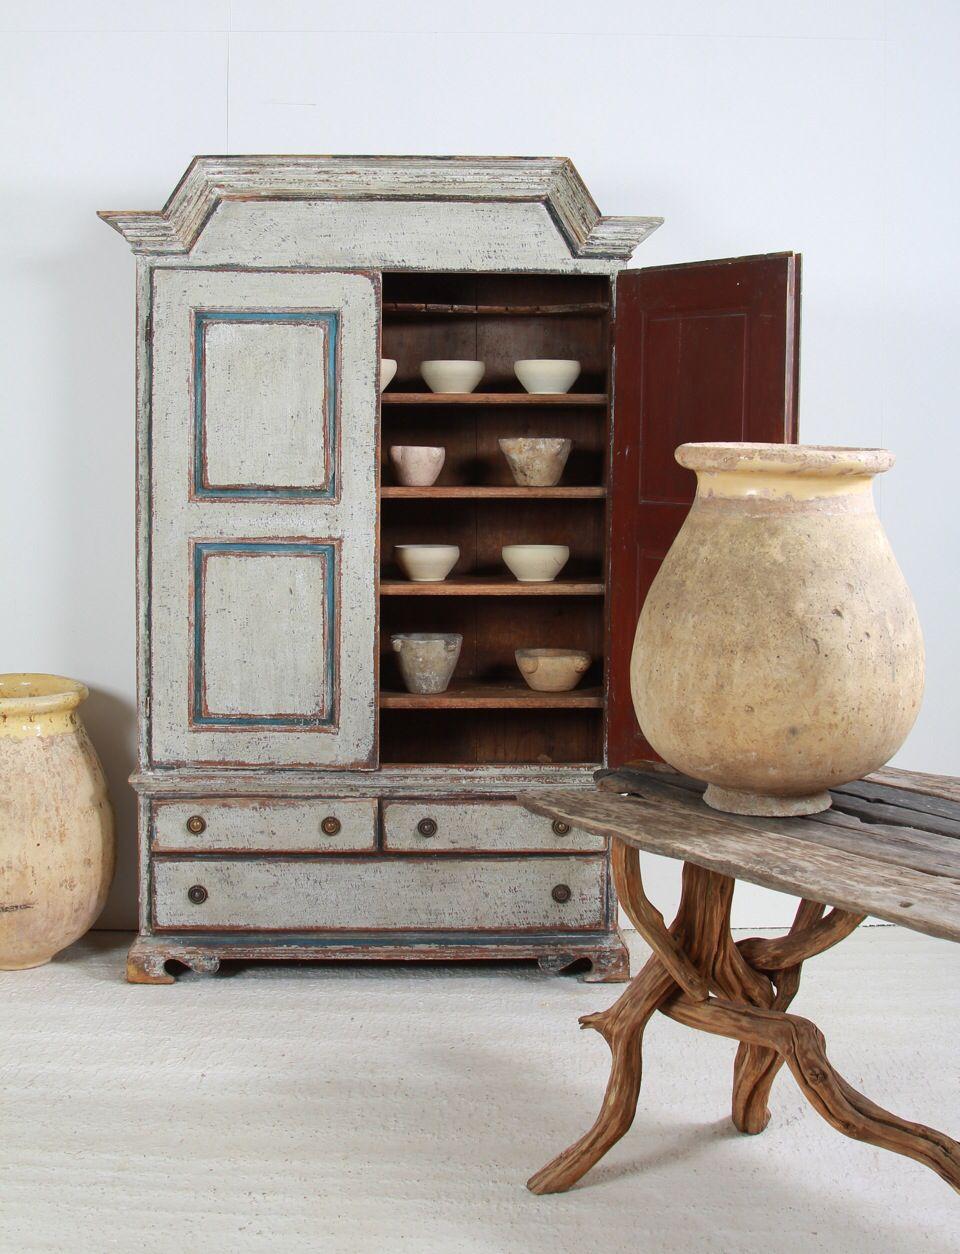 Anton K Antiques Antique Interior Gustavian Furniture Swedish Gustavian Furniture